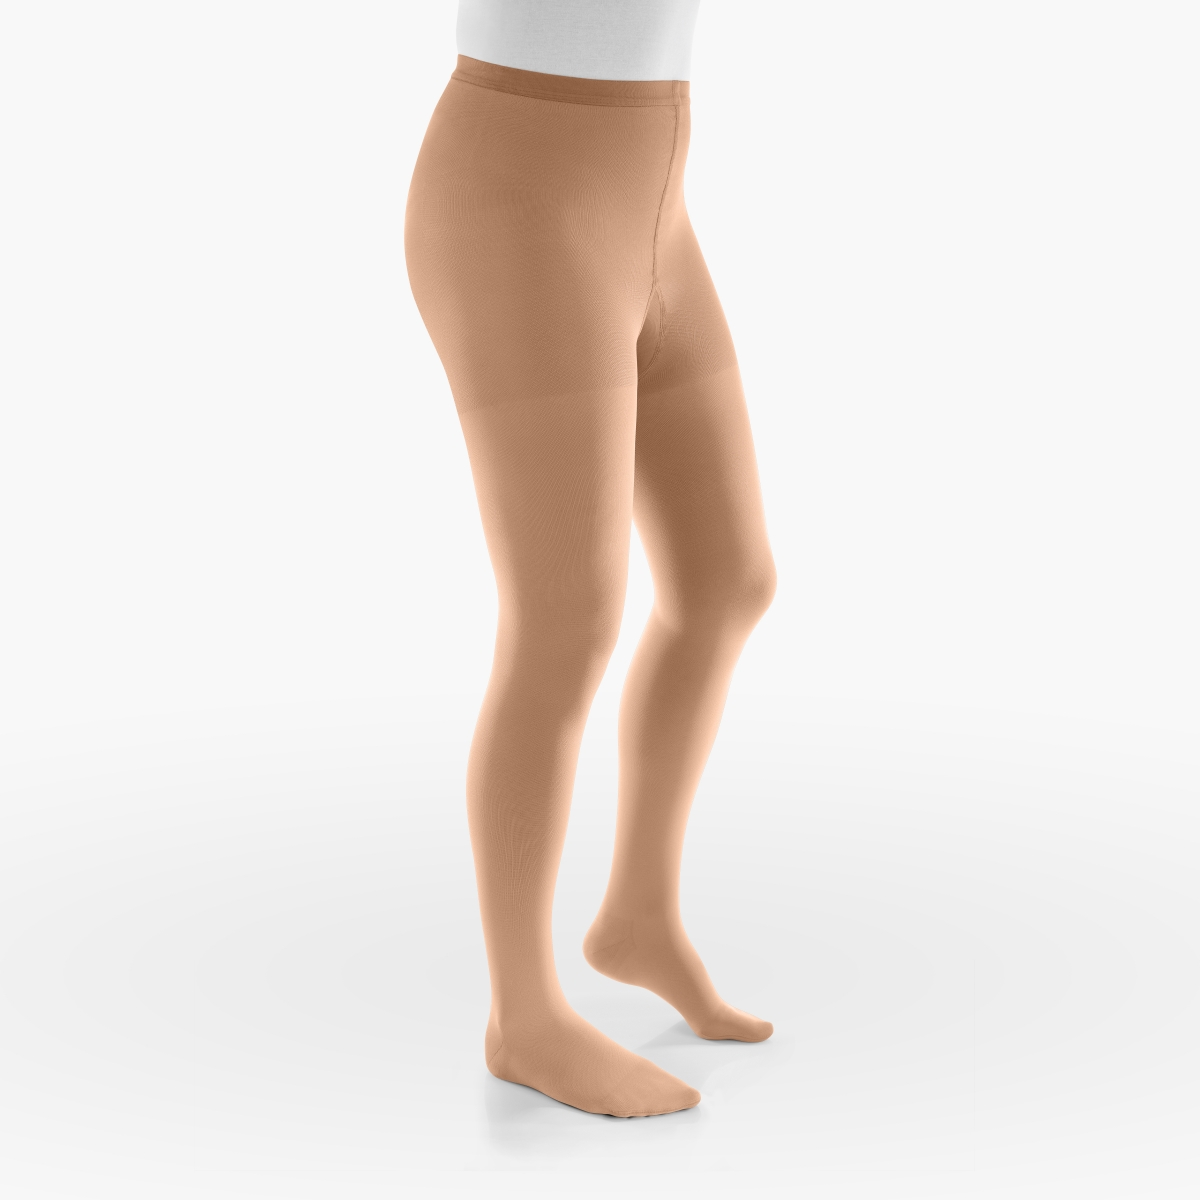 VENOSAN 4000 Pantyhose, 20-30 Beige, S, Closed Toe Firm 20-30 mmHg | Beige | S | Long | Closed Toe | Knit Top